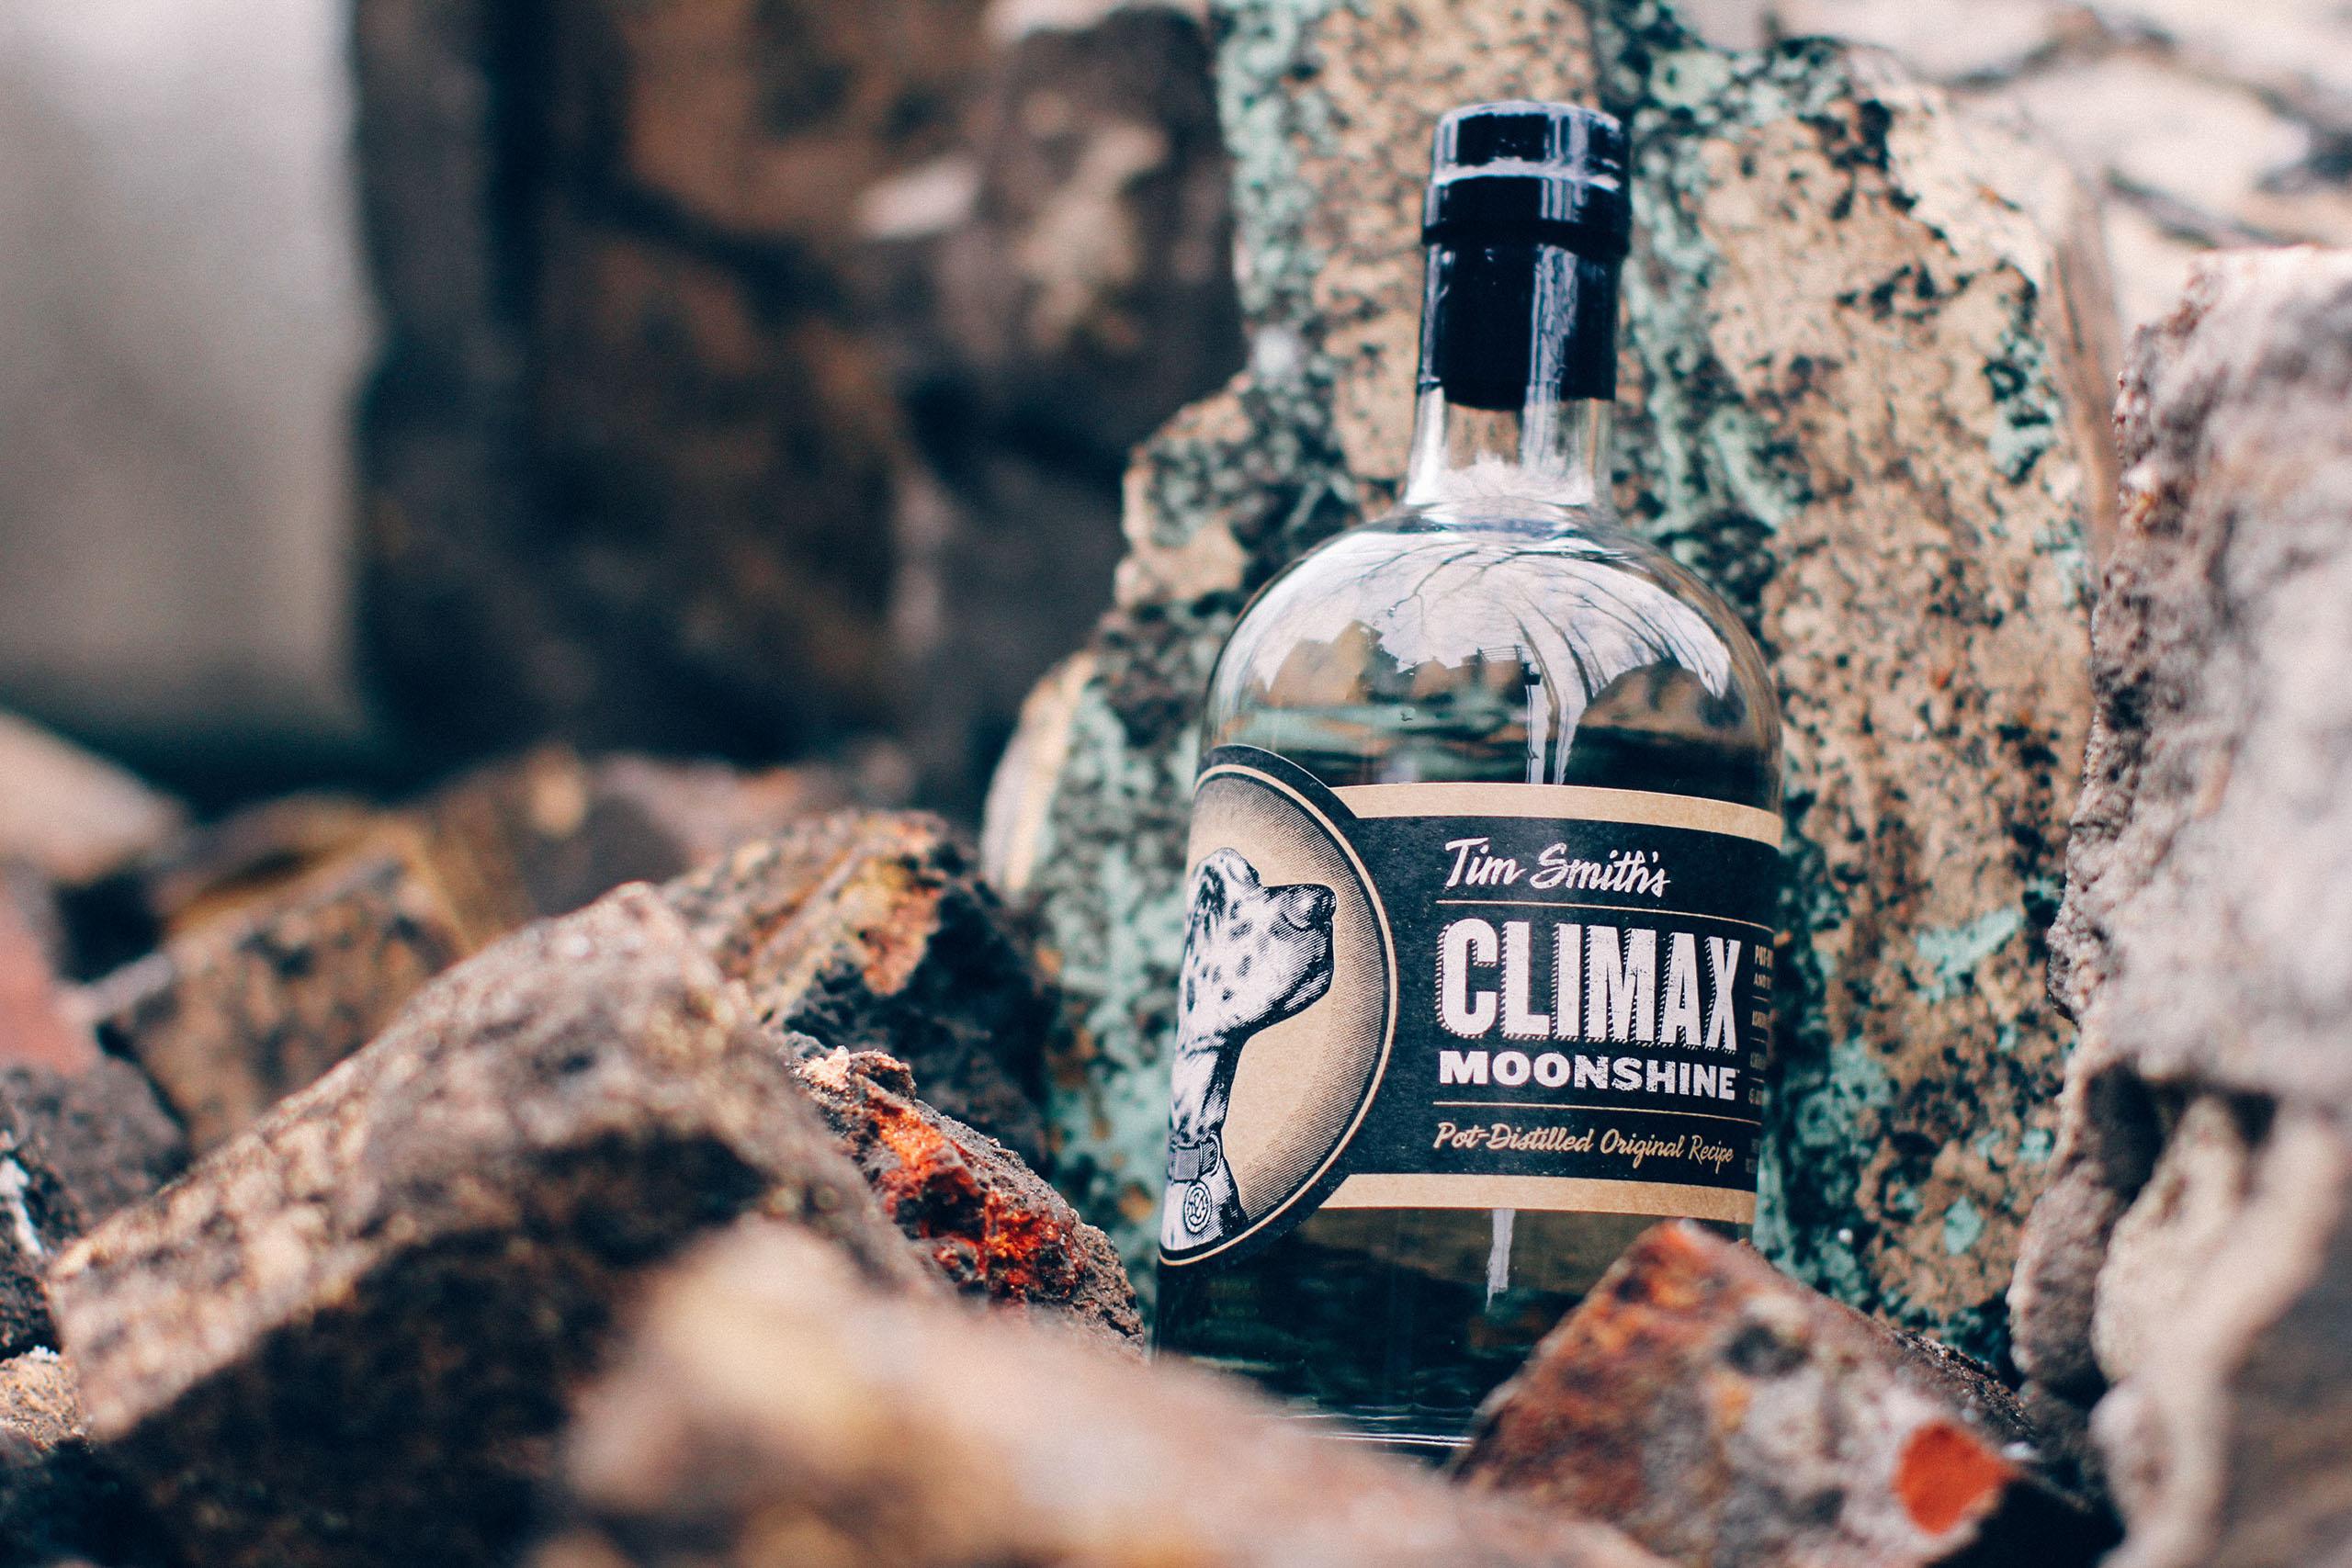 Climax Moonshine